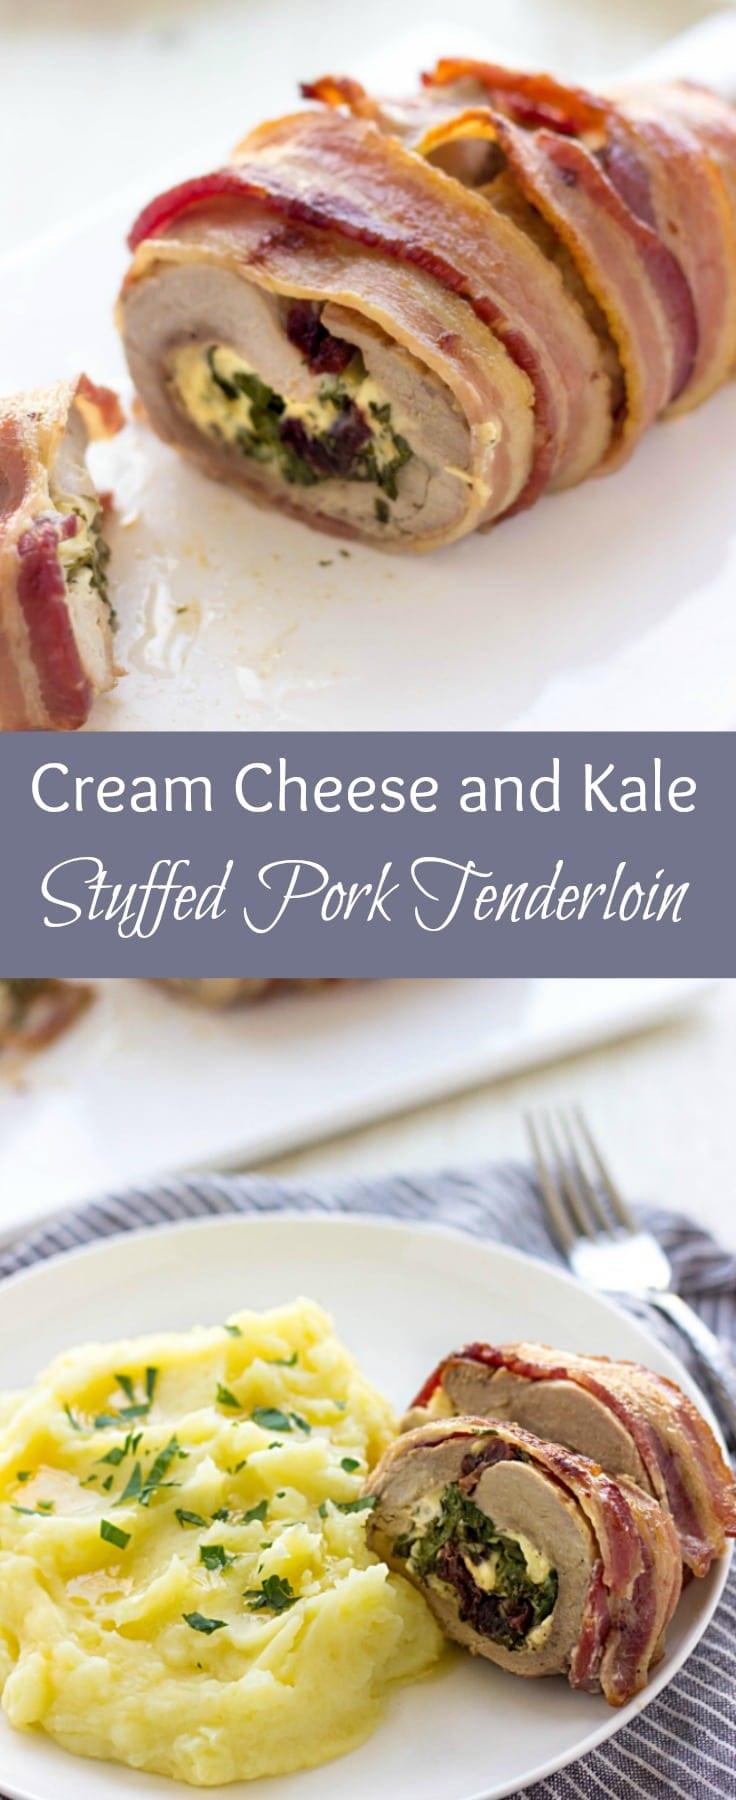 Cream Cheese Stuffed Pork Tenderloin  Cream Cheese And Kale Stuffed Baked Pork Tenderloin